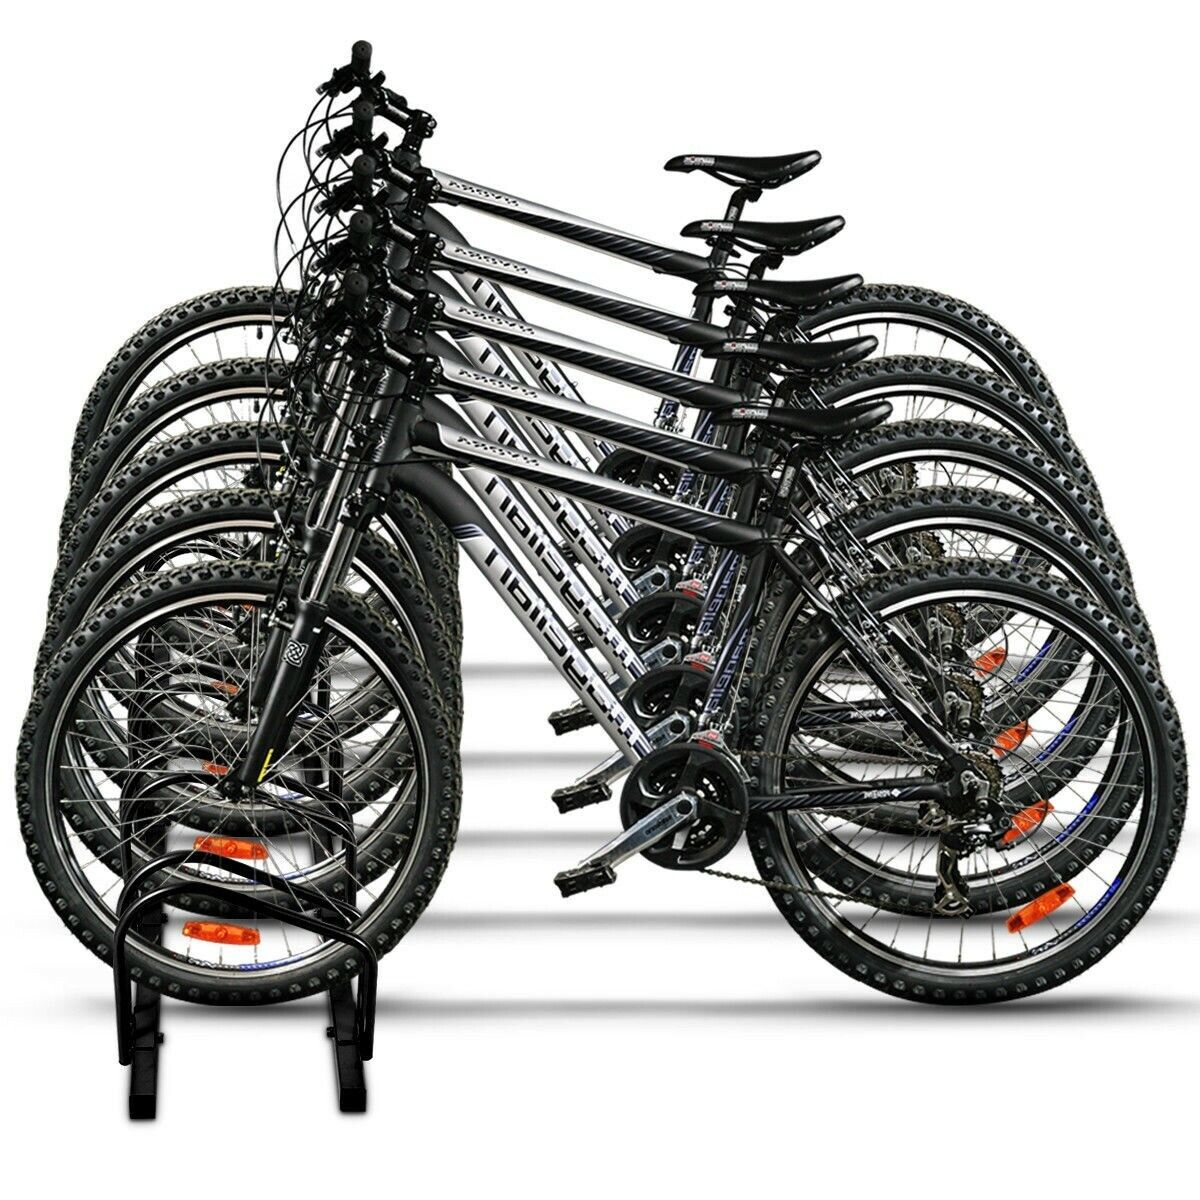 Five Bike Wheel Rack Storage Organizer Floor Mount Vertical